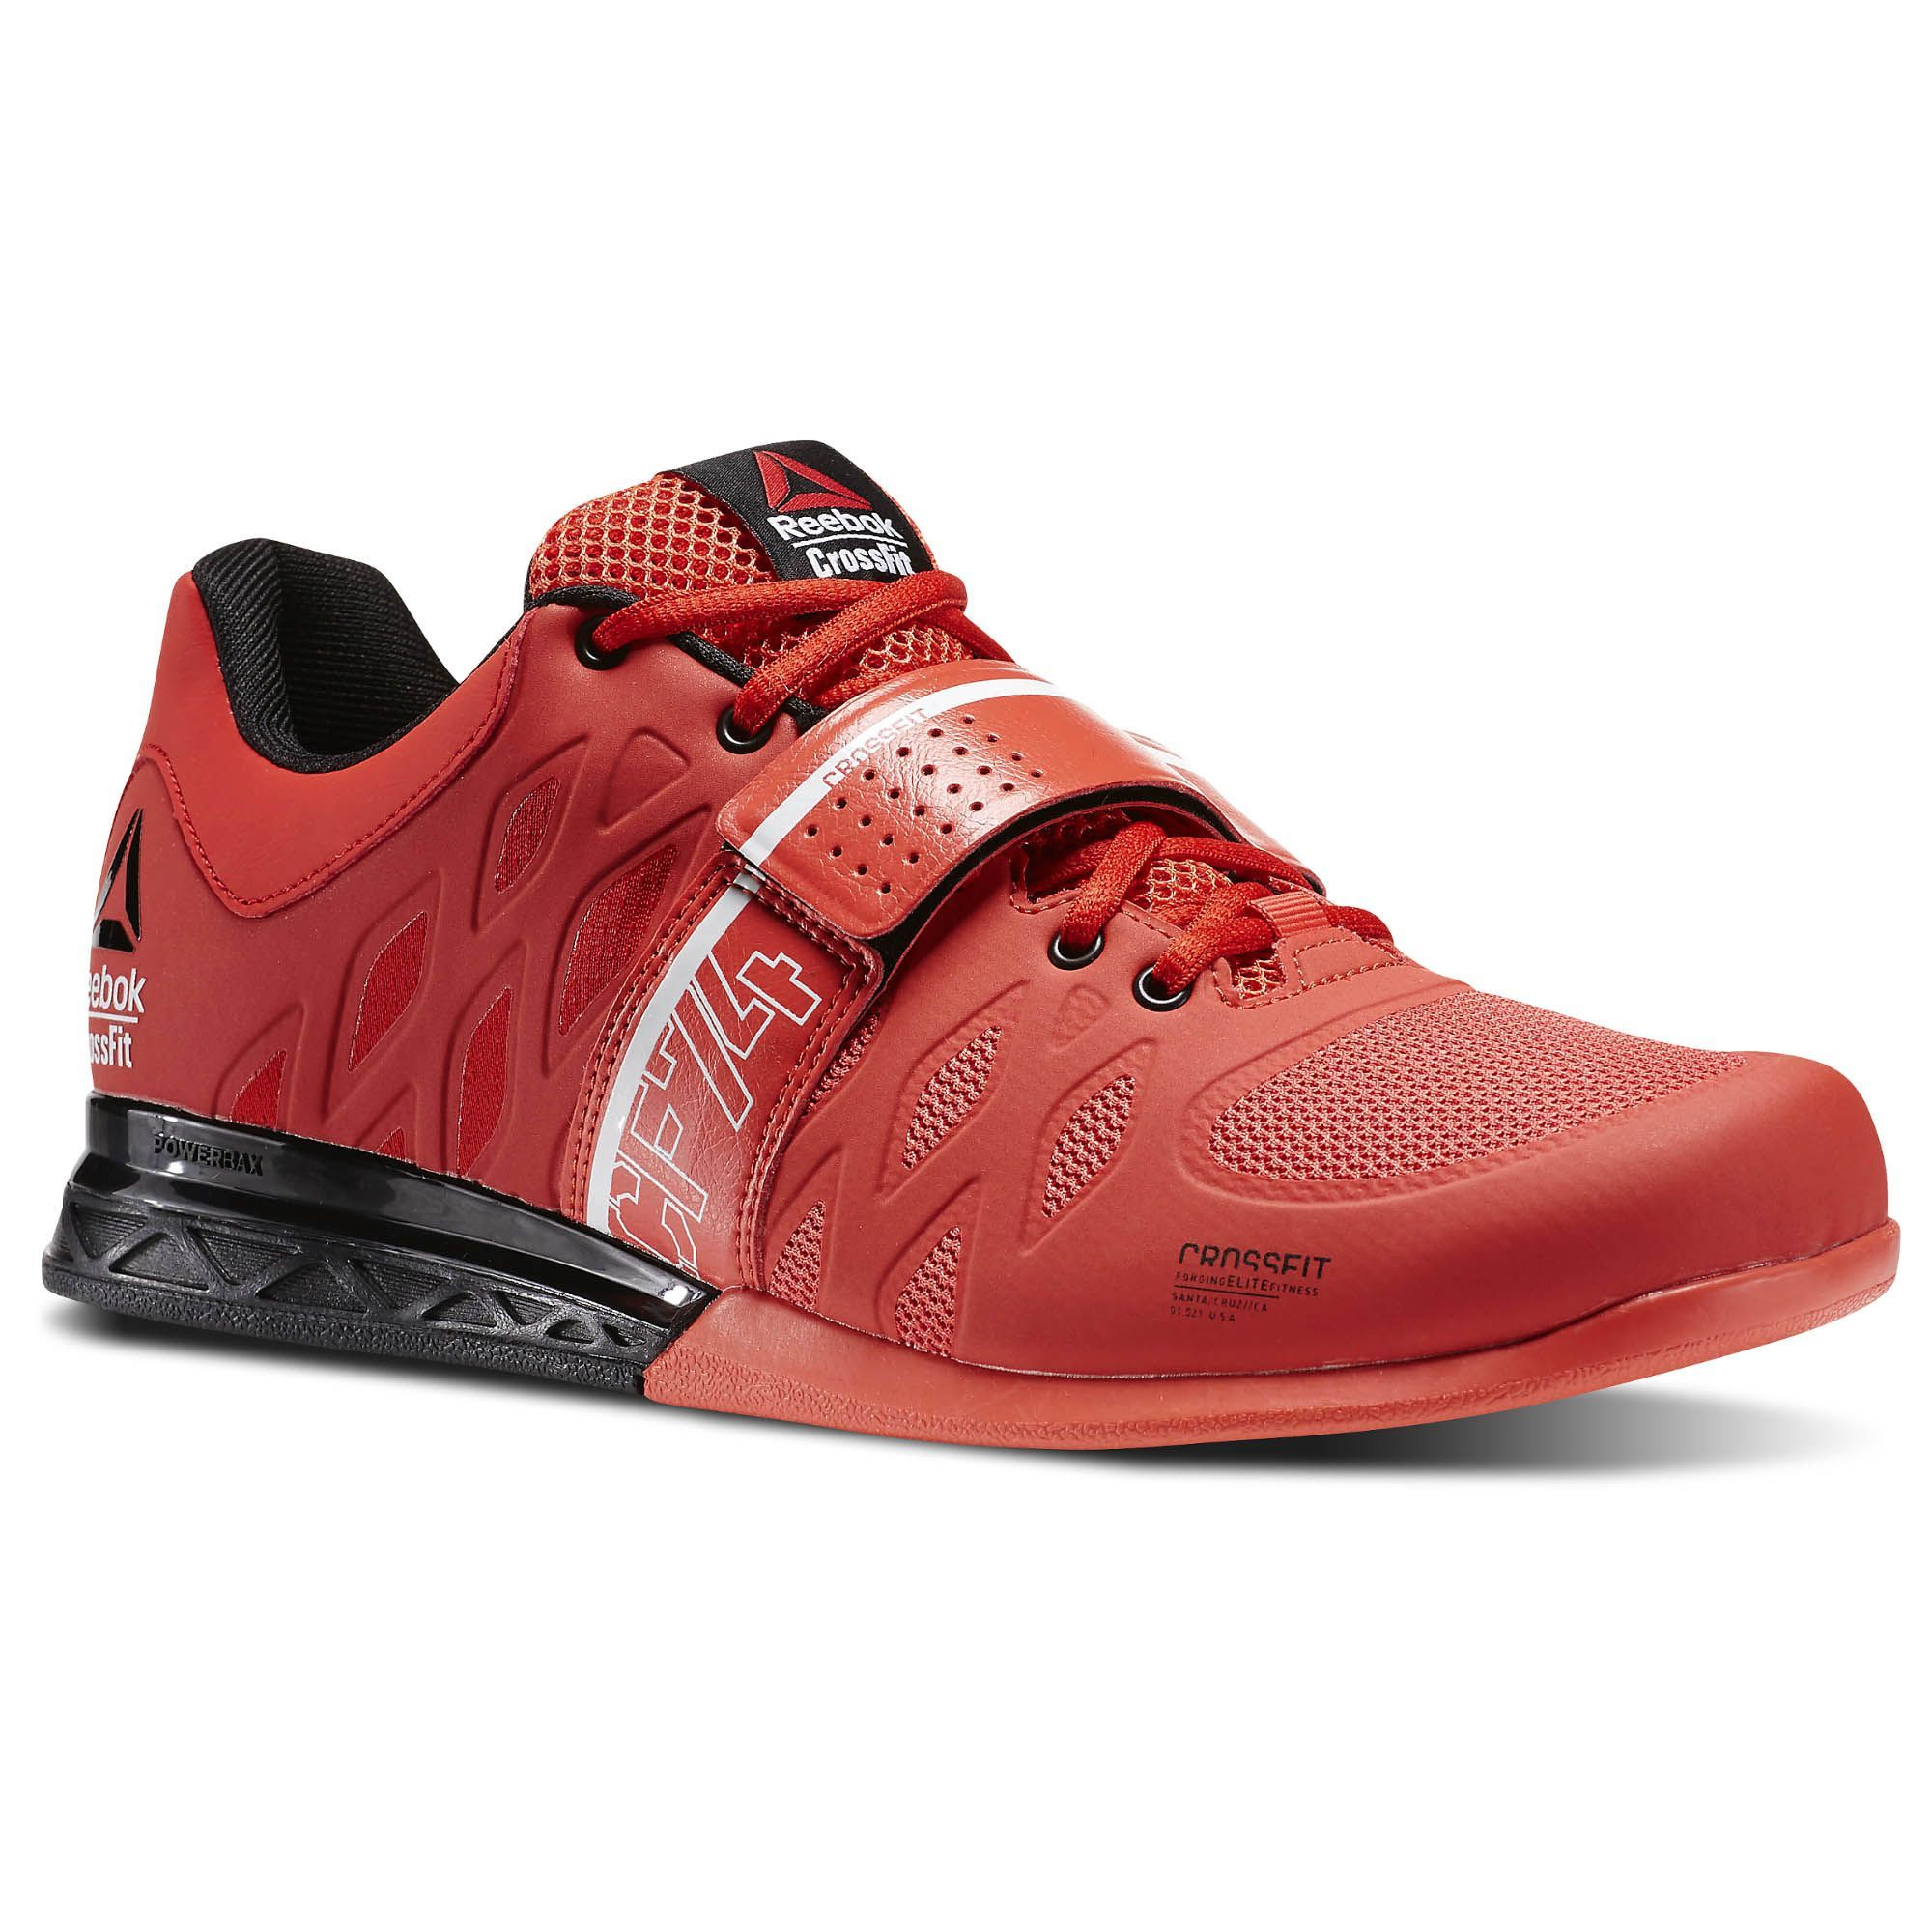 Reebok - Tenis Reebok CrossFit Lifter 2.0  38694f613b71c